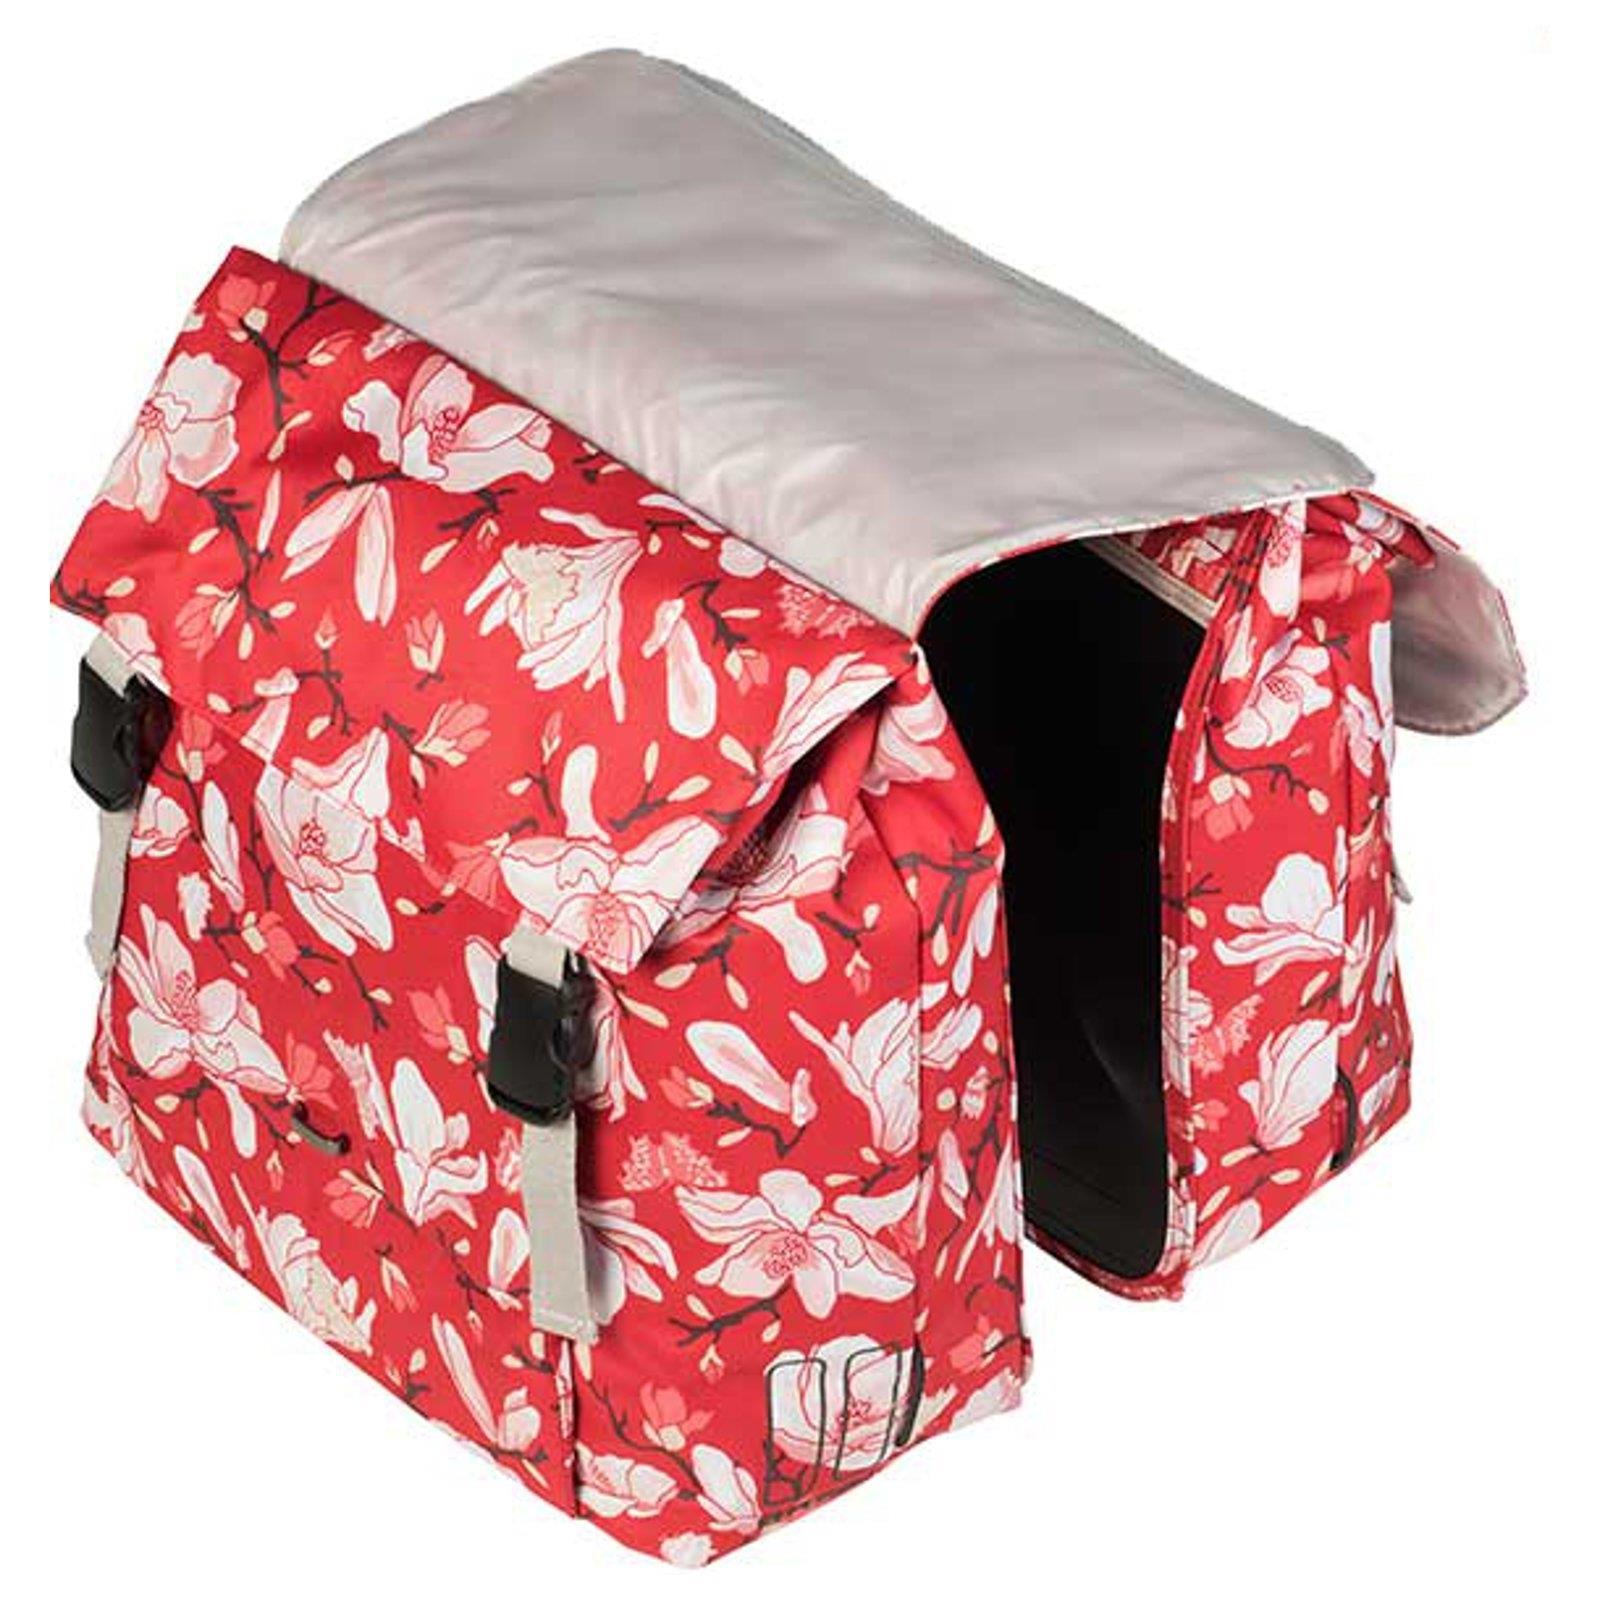 basil magnolia doppel packtasche 35 l fahrrad damen. Black Bedroom Furniture Sets. Home Design Ideas